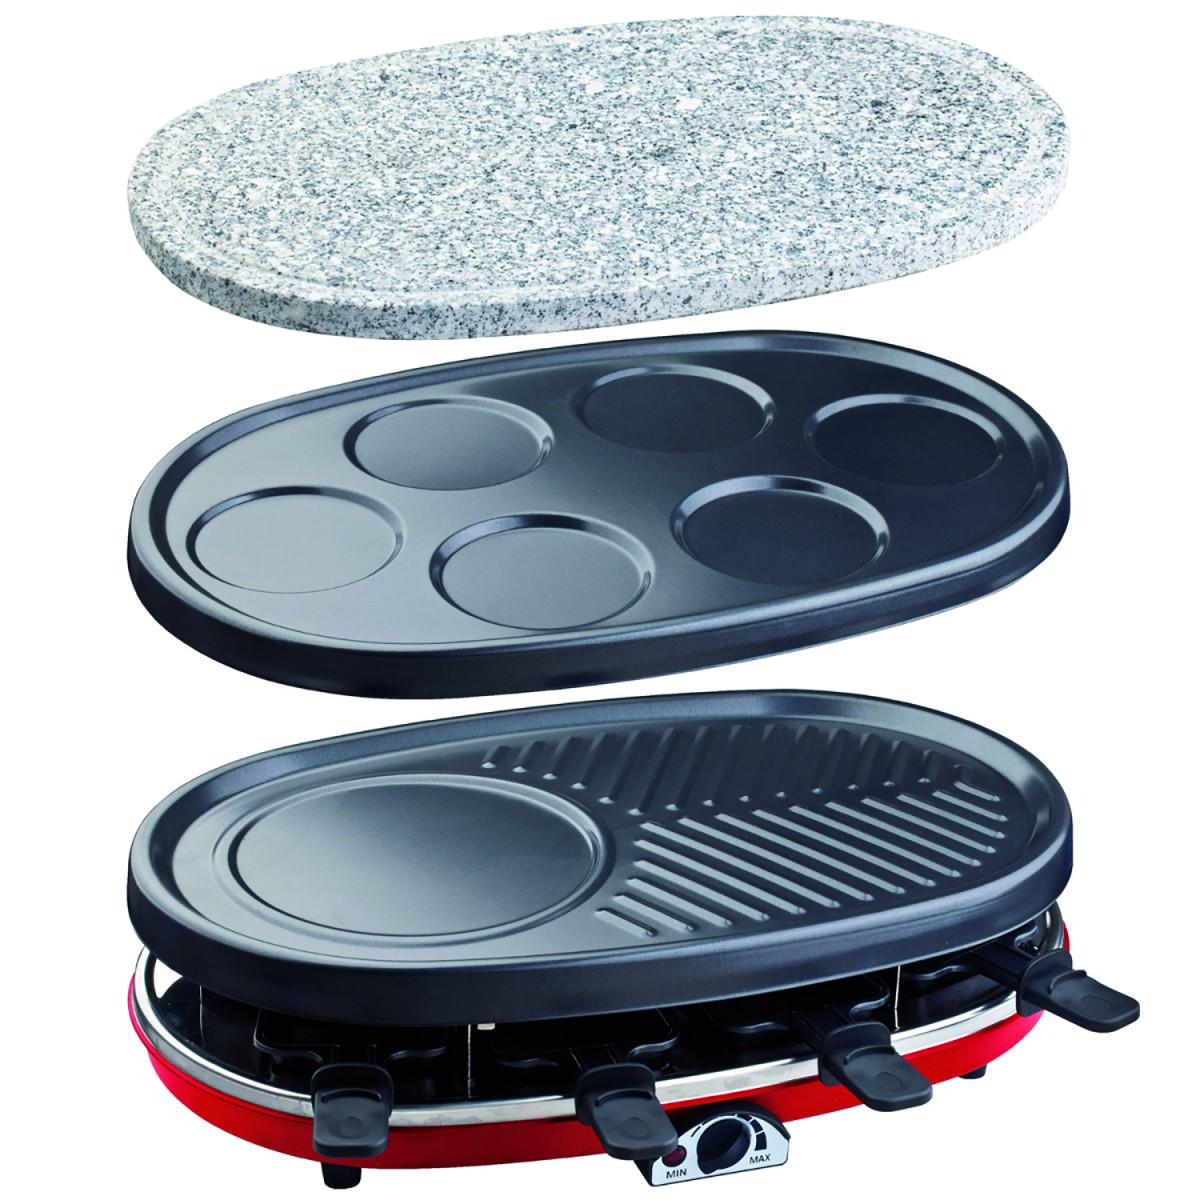 Raclette-Grill 4 in 1 H.Koenig RP418 – Bild 1